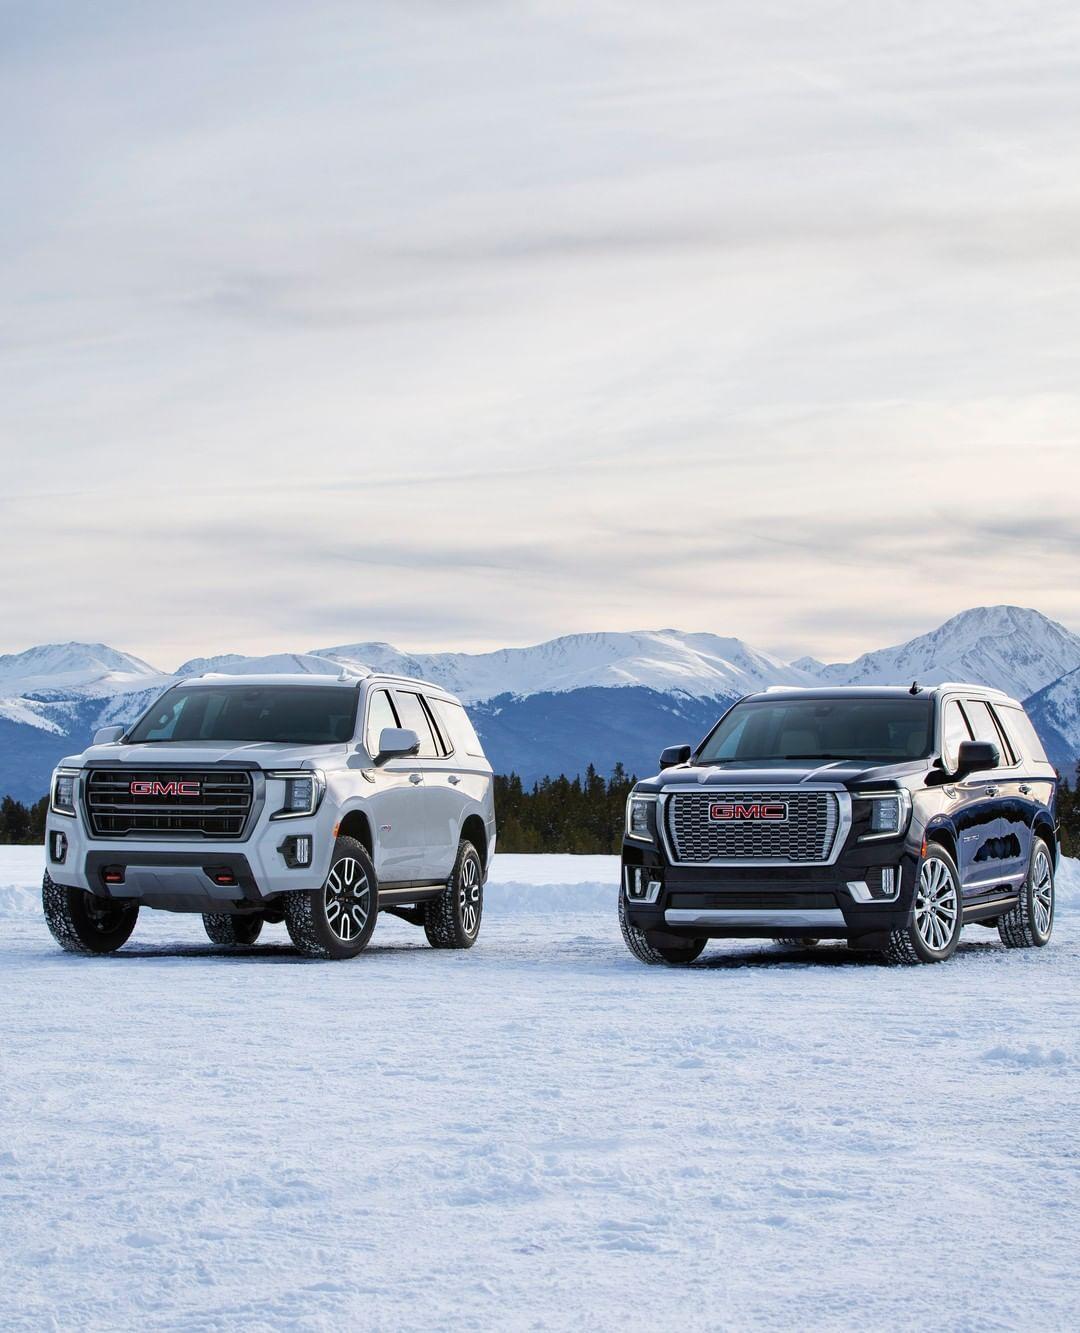 Motortrend On Instagram Do The Newest Gmc Yukon And Yukon Xl Full Size Suvs Finally Justify Their Price Premium Over In 2020 Gmc Yukon Denali Gmc Yukon Yukon Denali